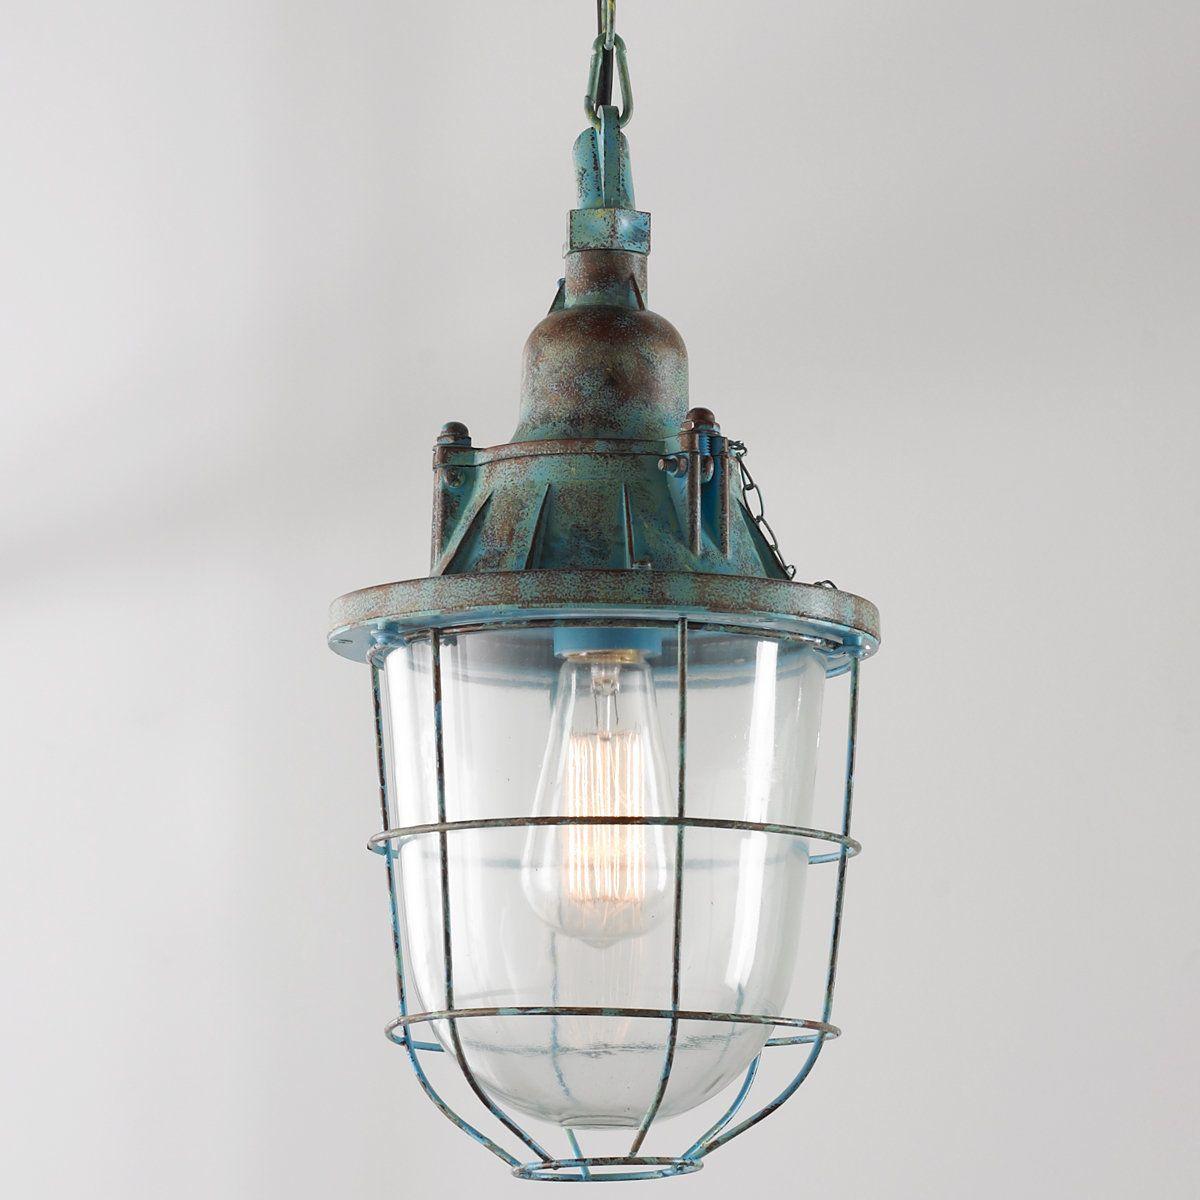 Distressed industrial hanging lantern pendant lantern pendant distressed industrial hanging lantern pendant distressedturquoise mozeypictures Images